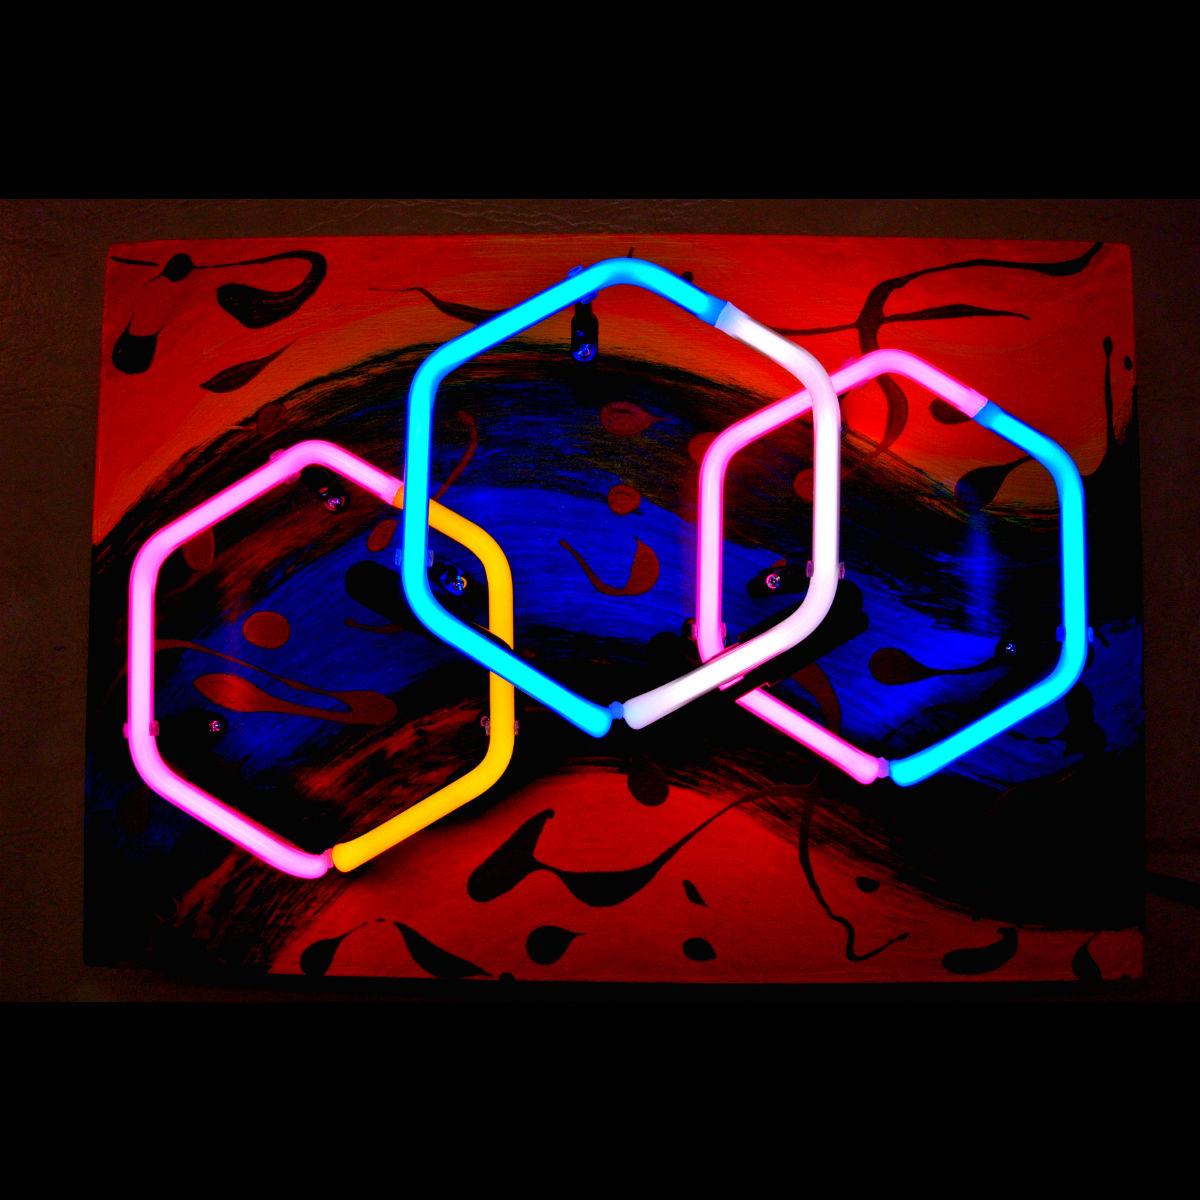 Parisian Neon Light Sculpture